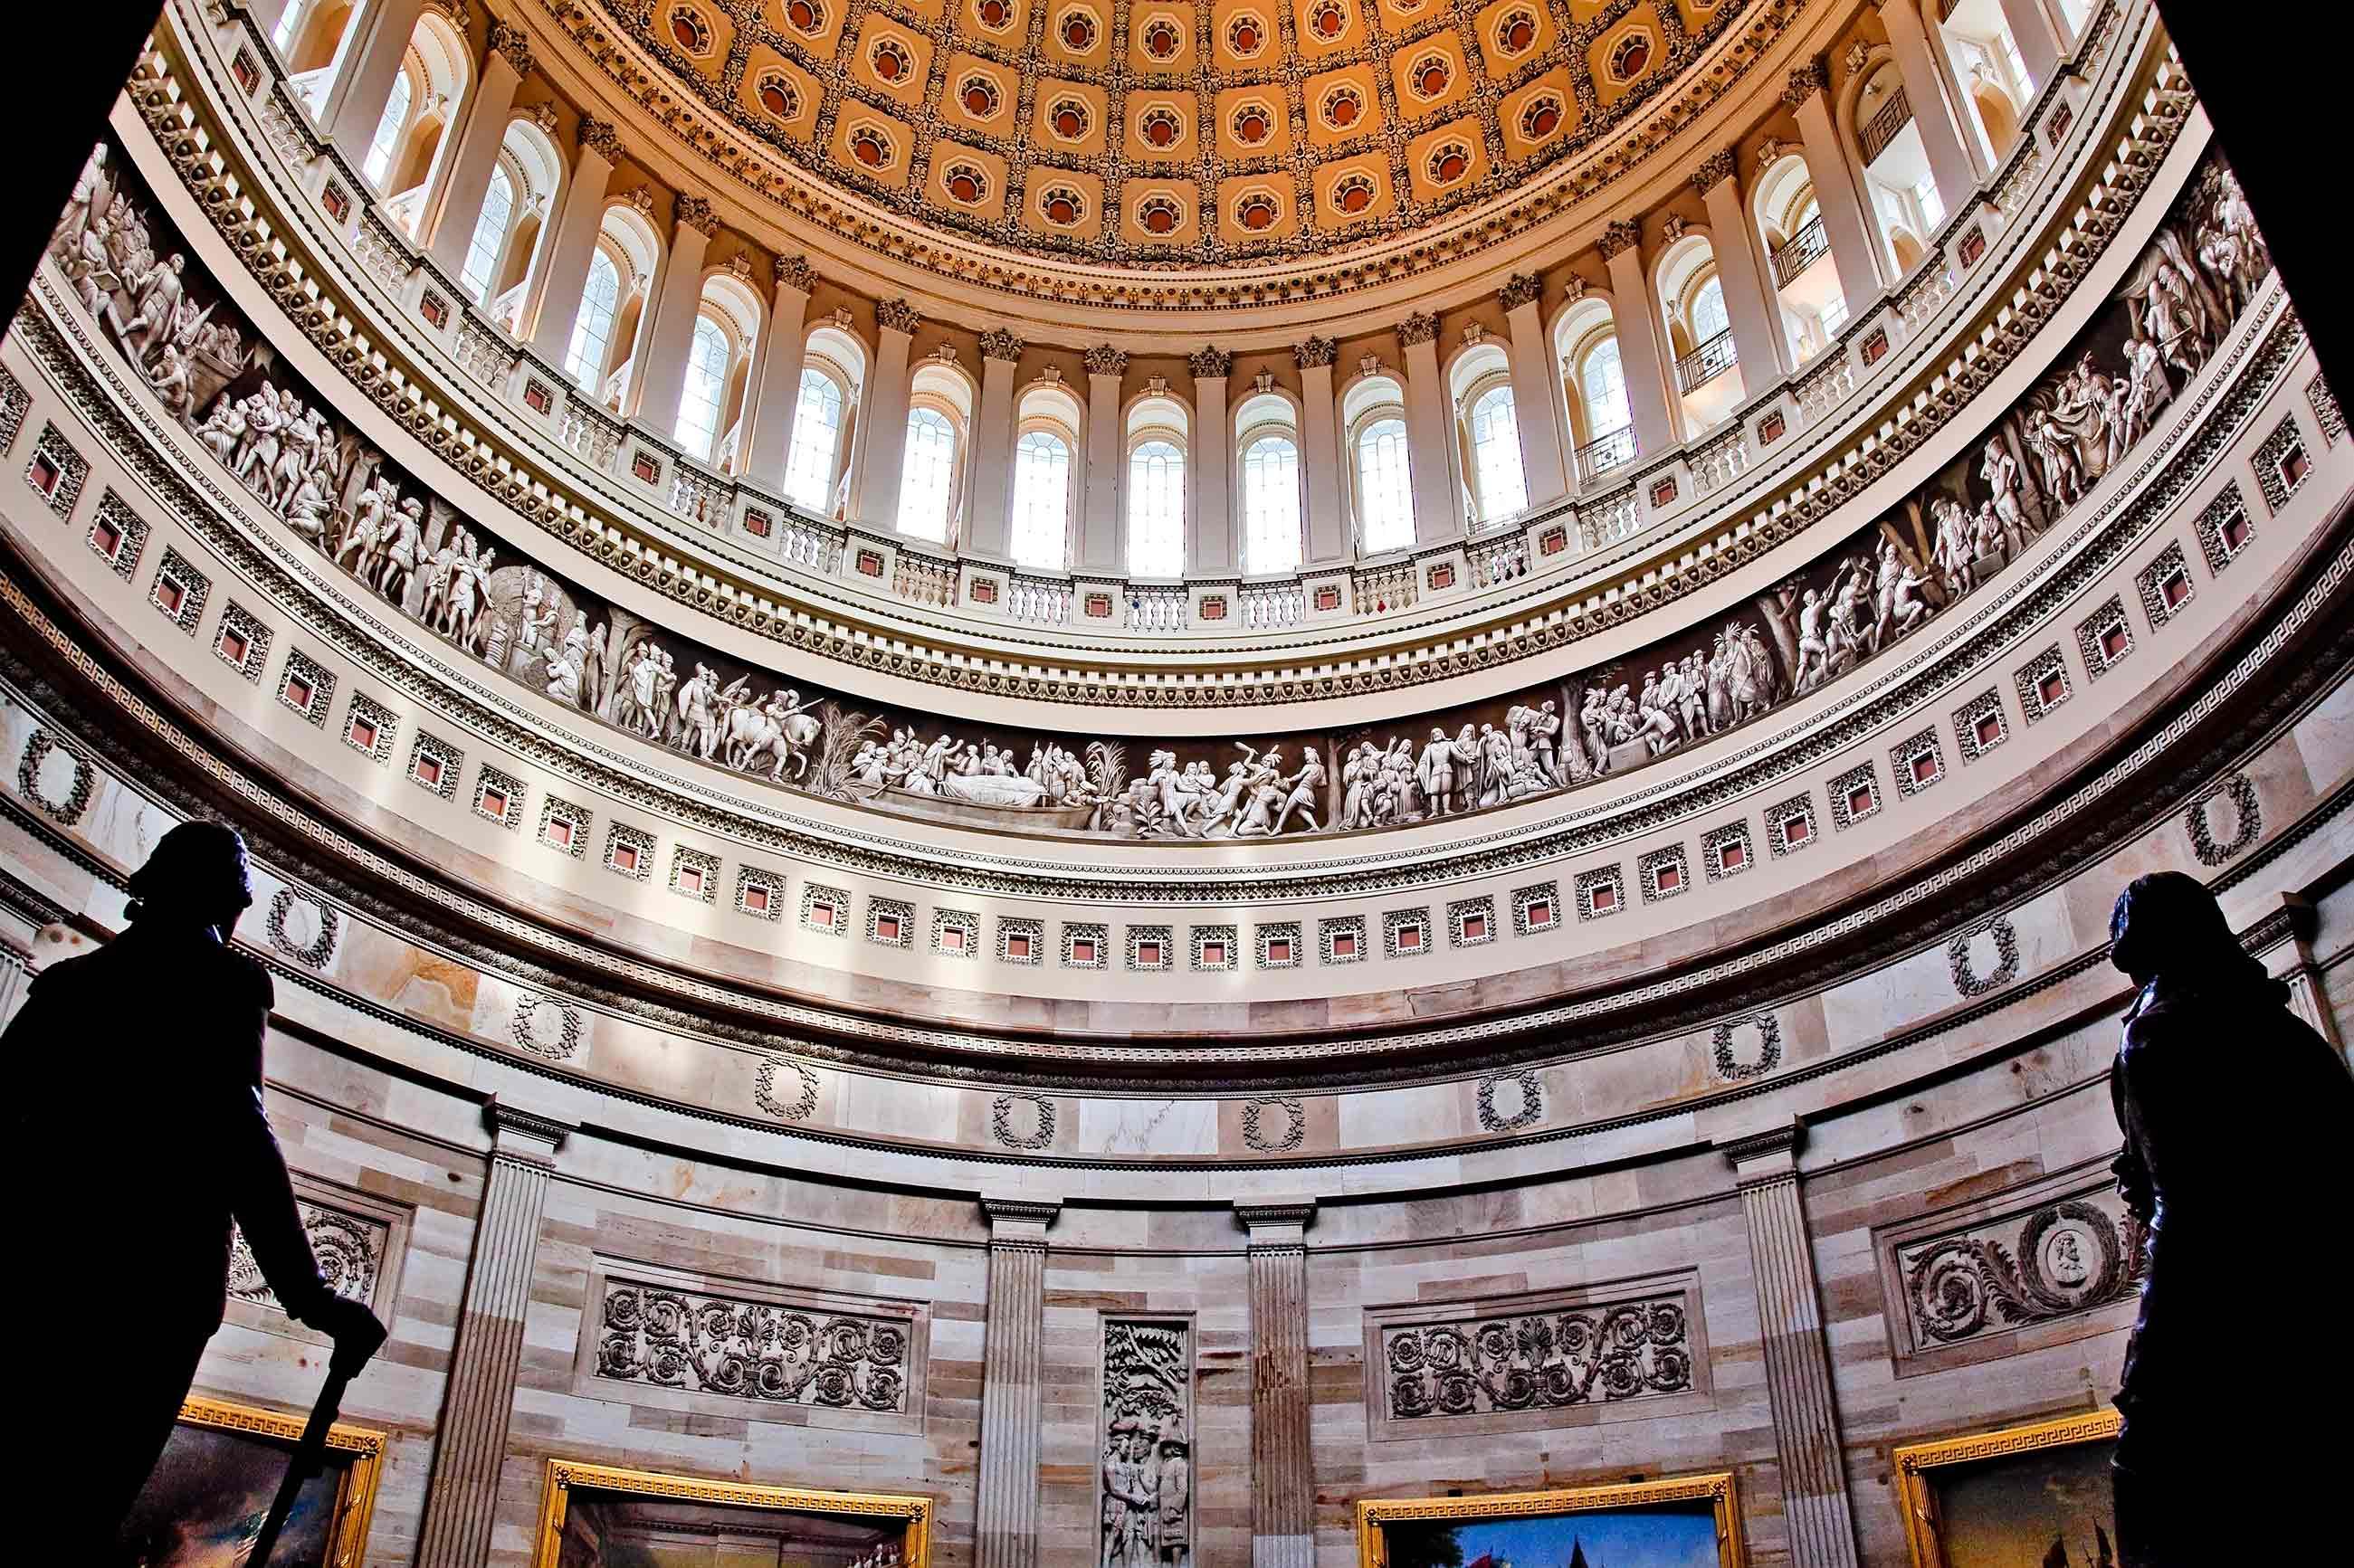 Inside the U.S. Capitol building